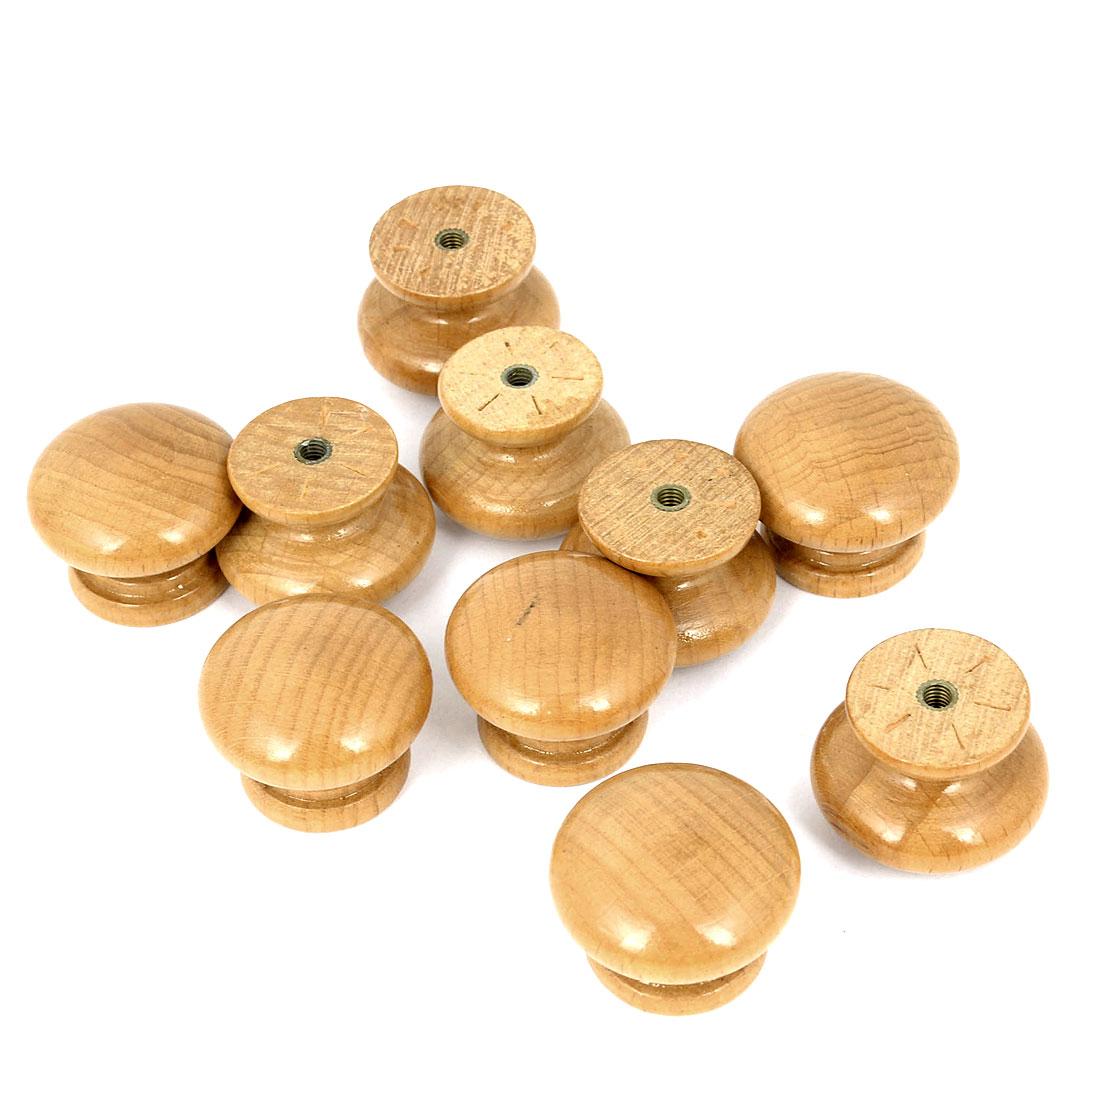 Cupboard Wardrobe Drawer Round Wooden Knobs Pull Knobs Light Brown 5 Pairs